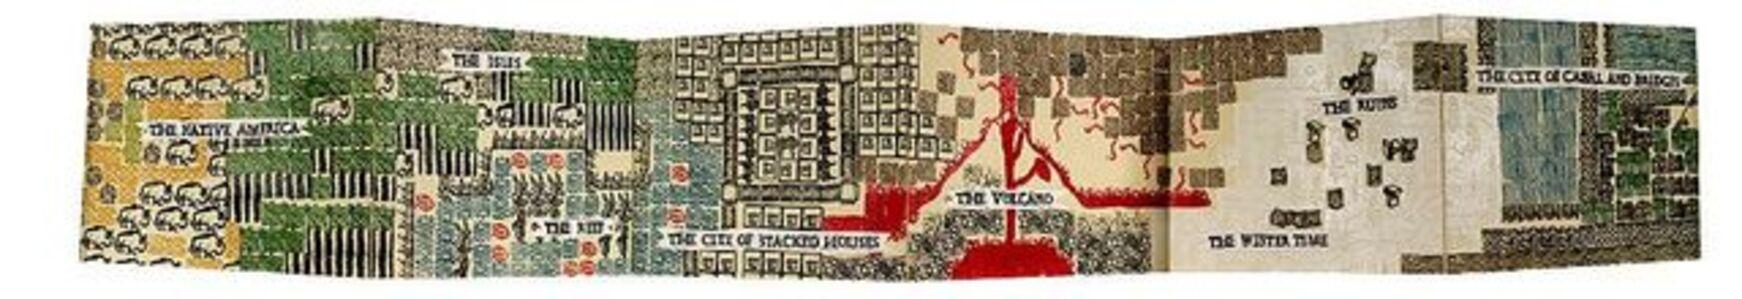 Veronica Graham, 'The Map of Neighboring Territories: Stamp Book', 2008